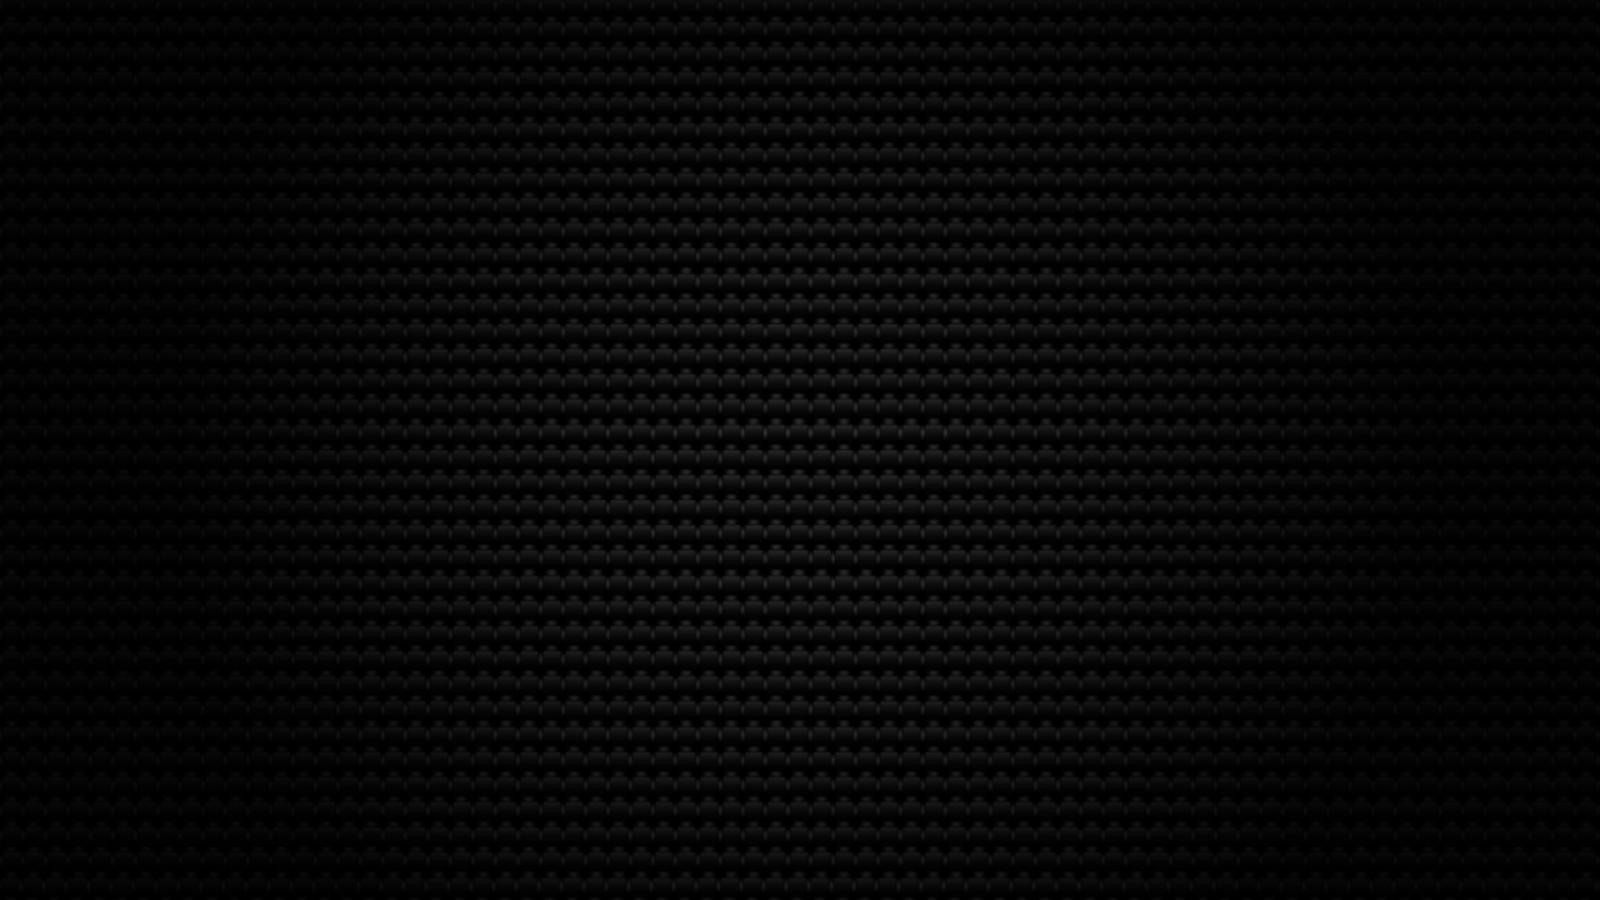 Abstract backgrounds black carbon fiber dark wallpaper 80685 1600x900